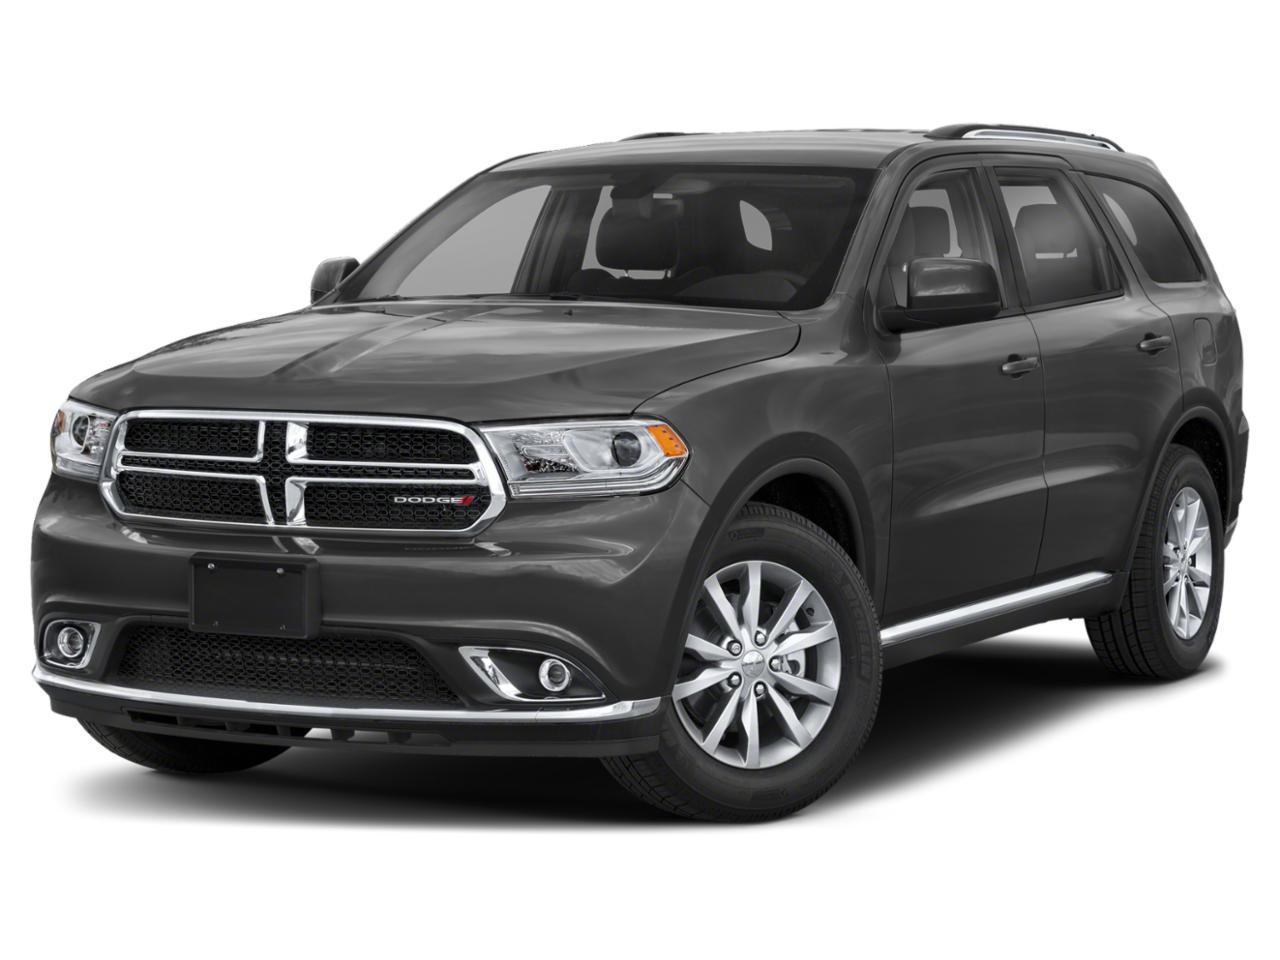 2019 Dodge Durango Vehicle Photo in Streetsboro, OH 44241